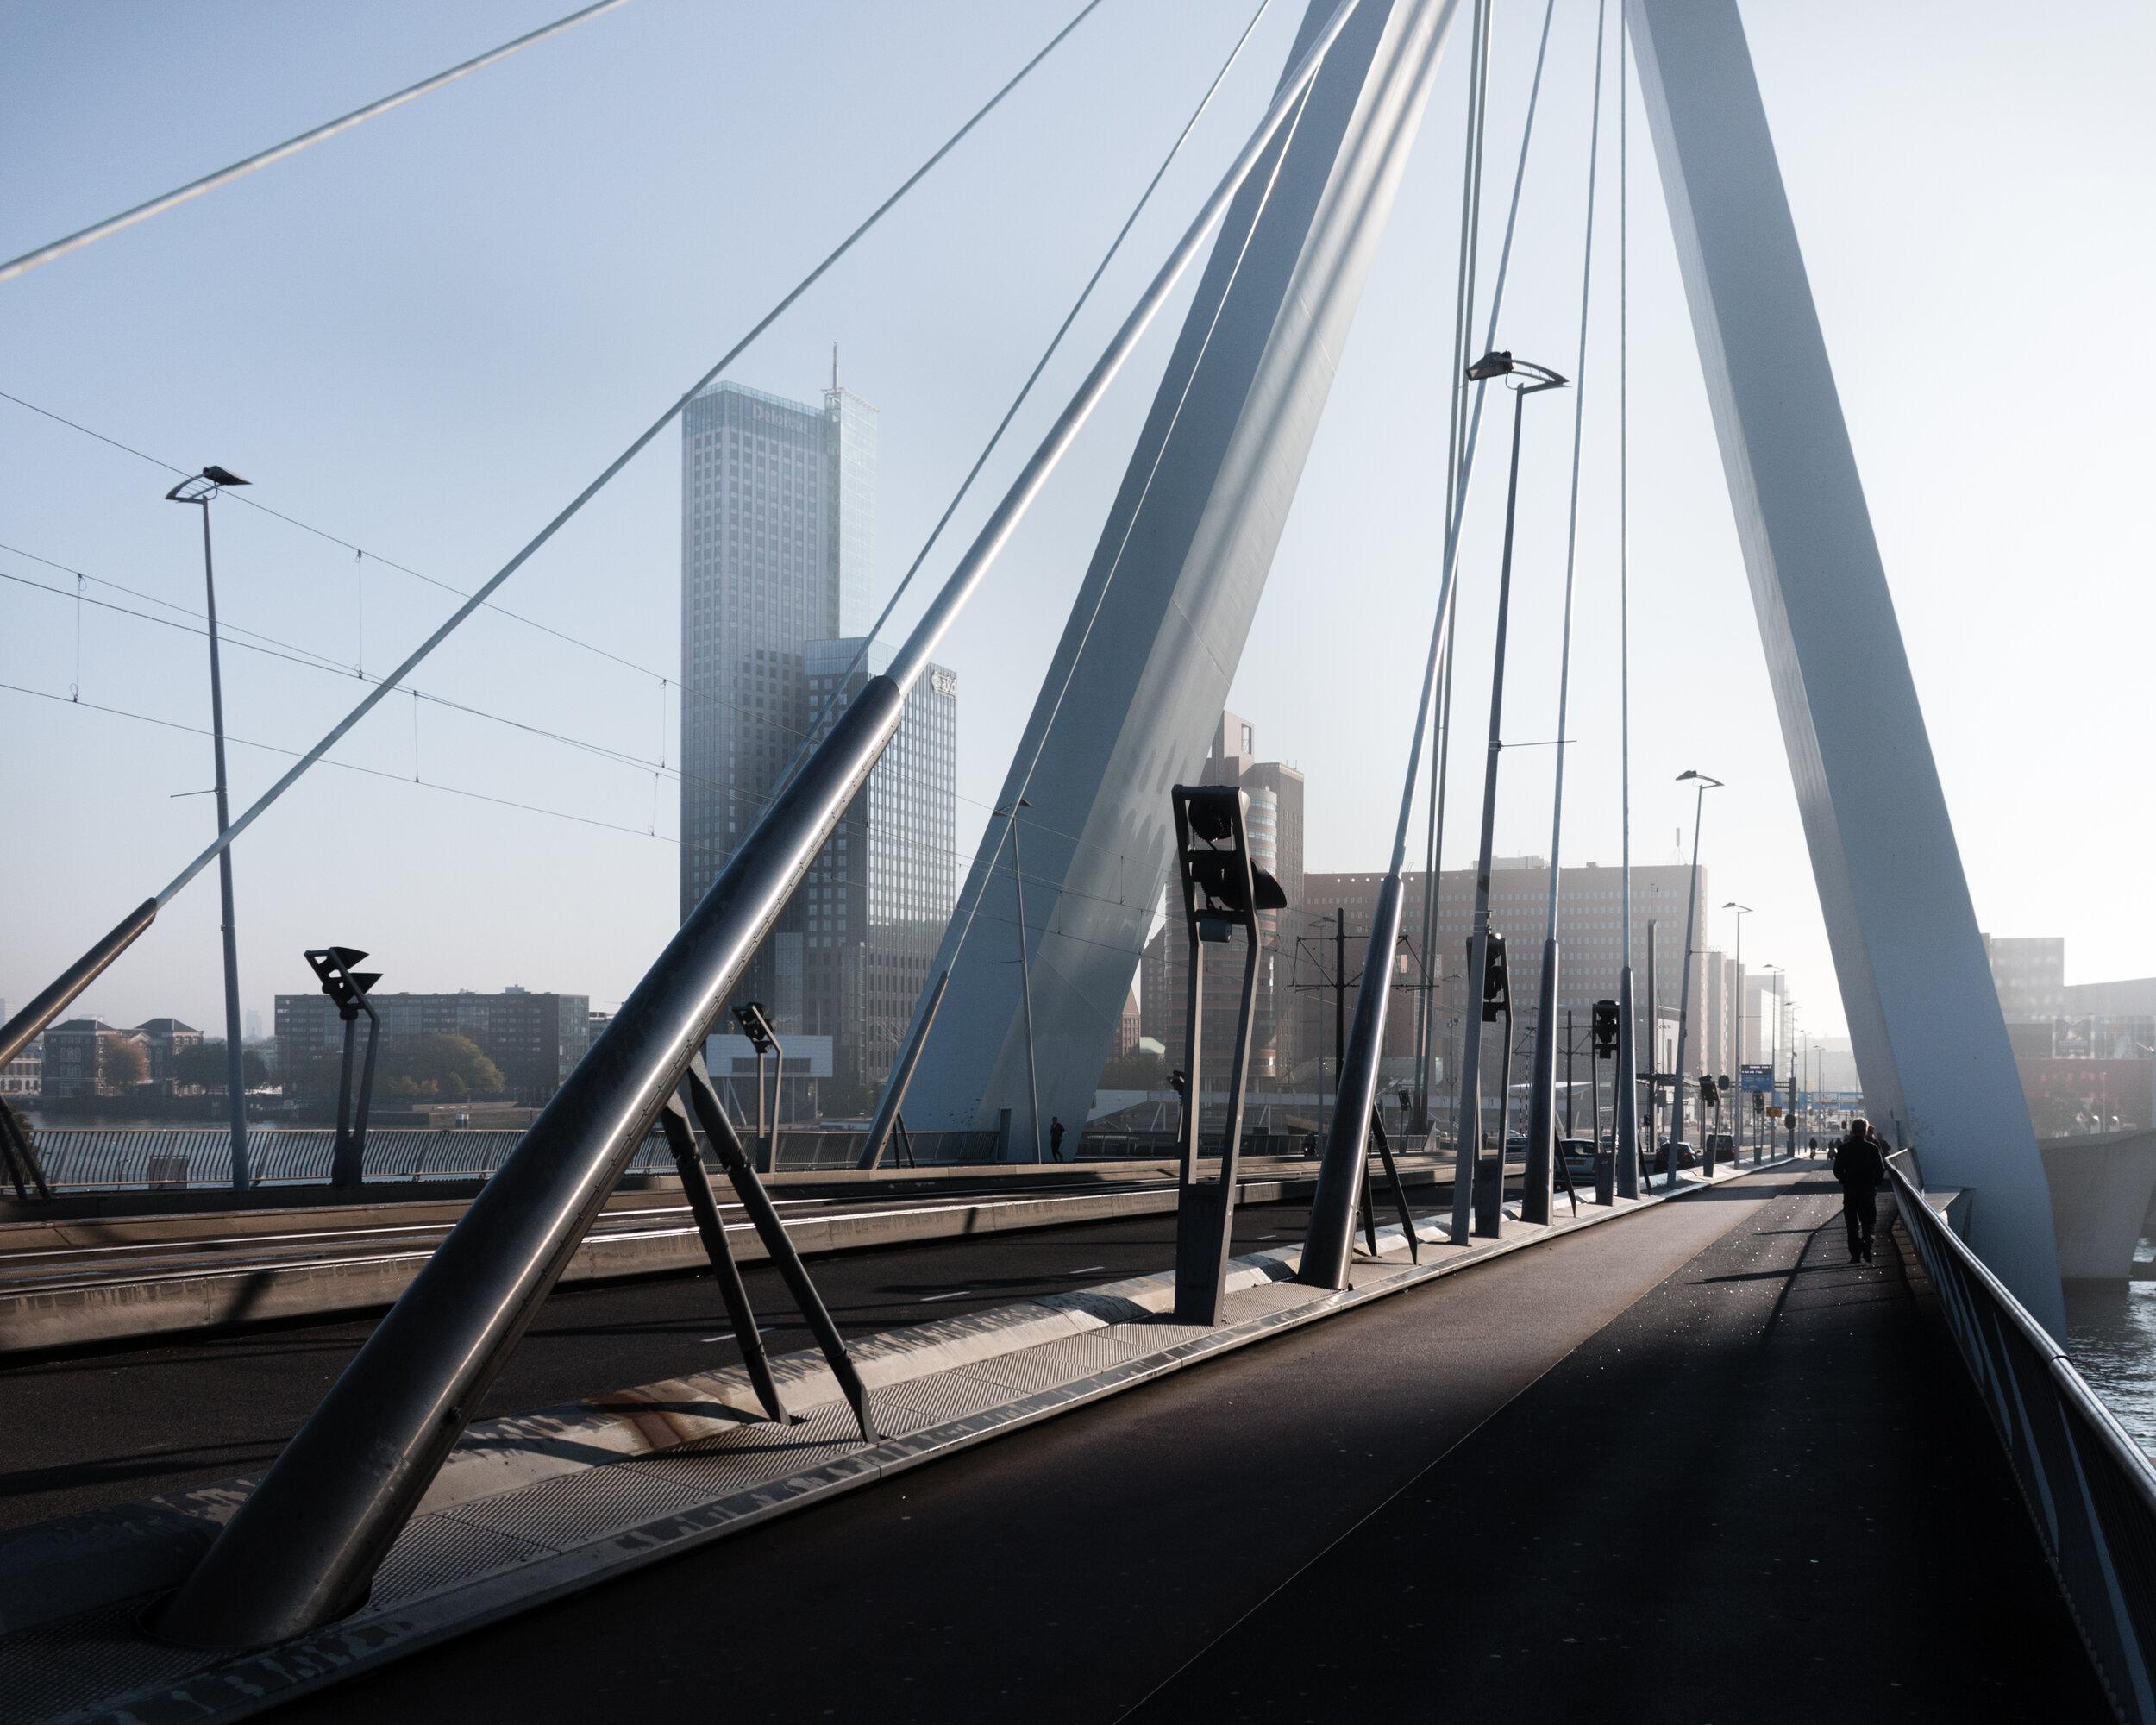 The Erasmus Bridge - Photography by Mike Dugenio-3.jpg